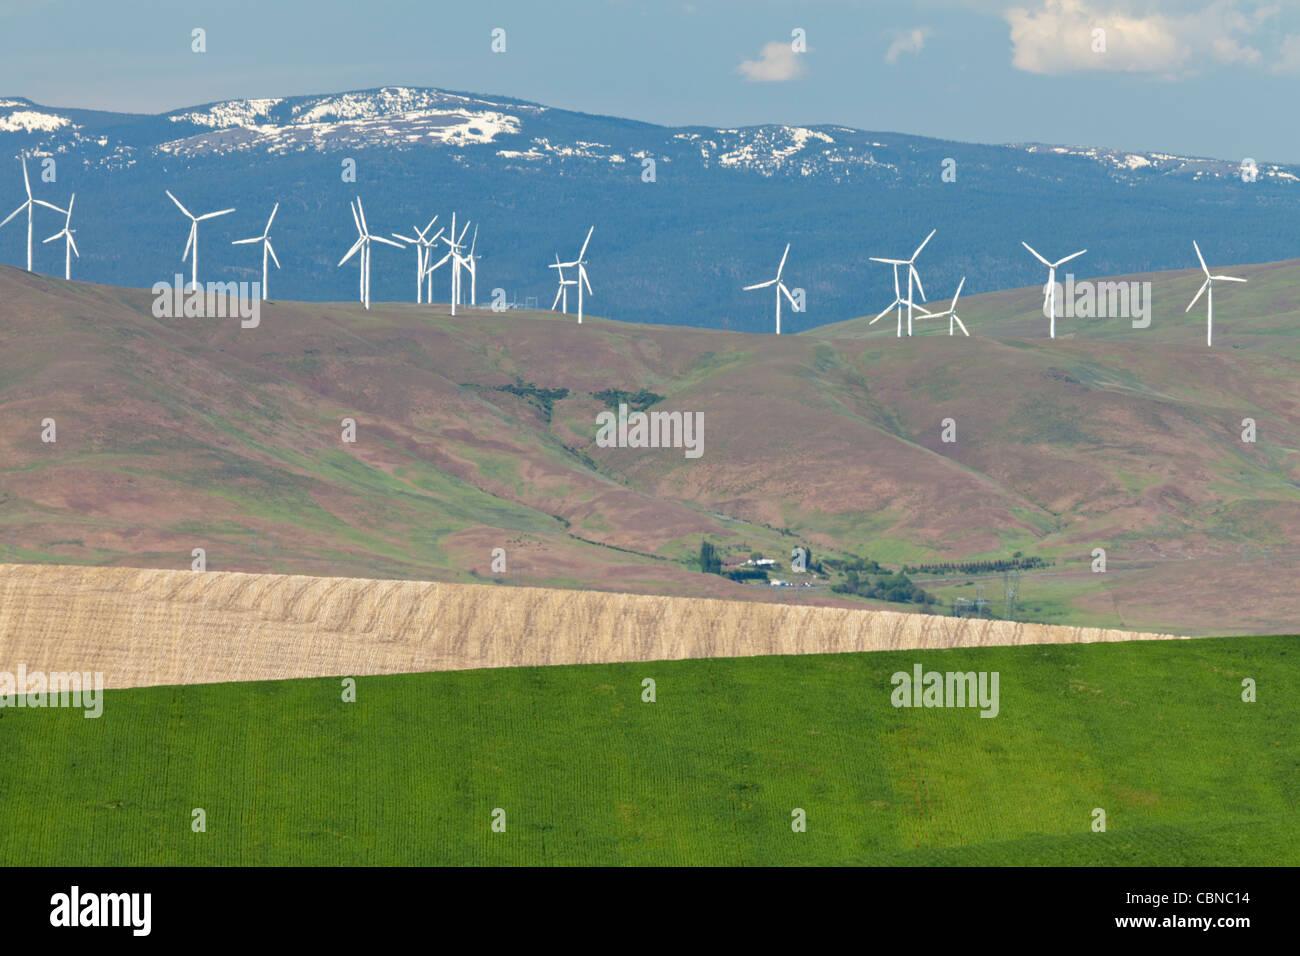 Farm fields, Wind Turbines, Near Wasco, Oregon - Stock Image